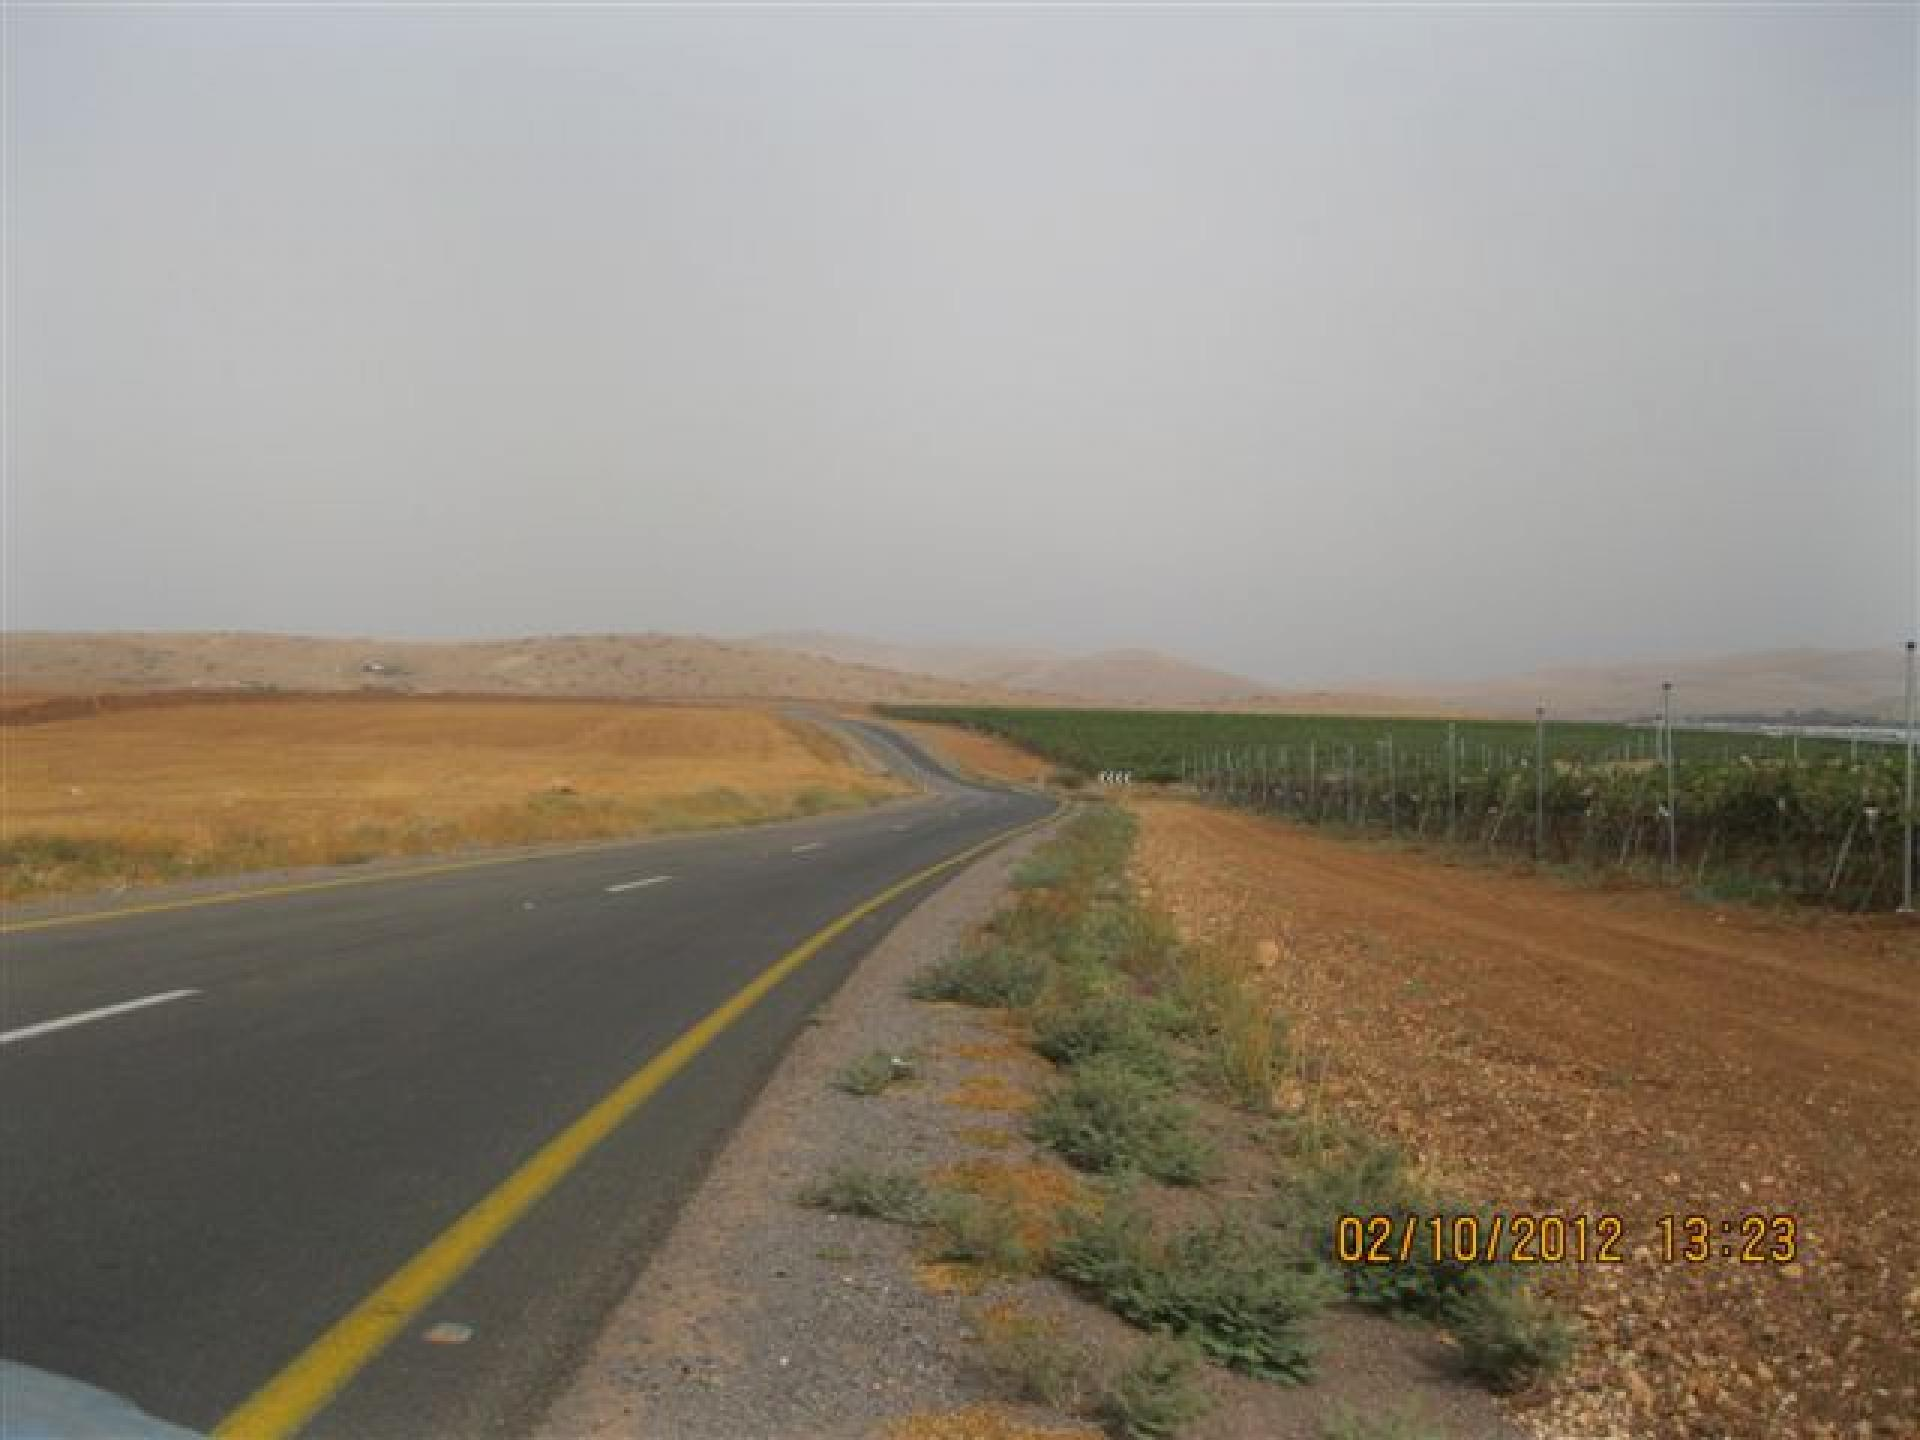 Alon road/route 578 02.10.12